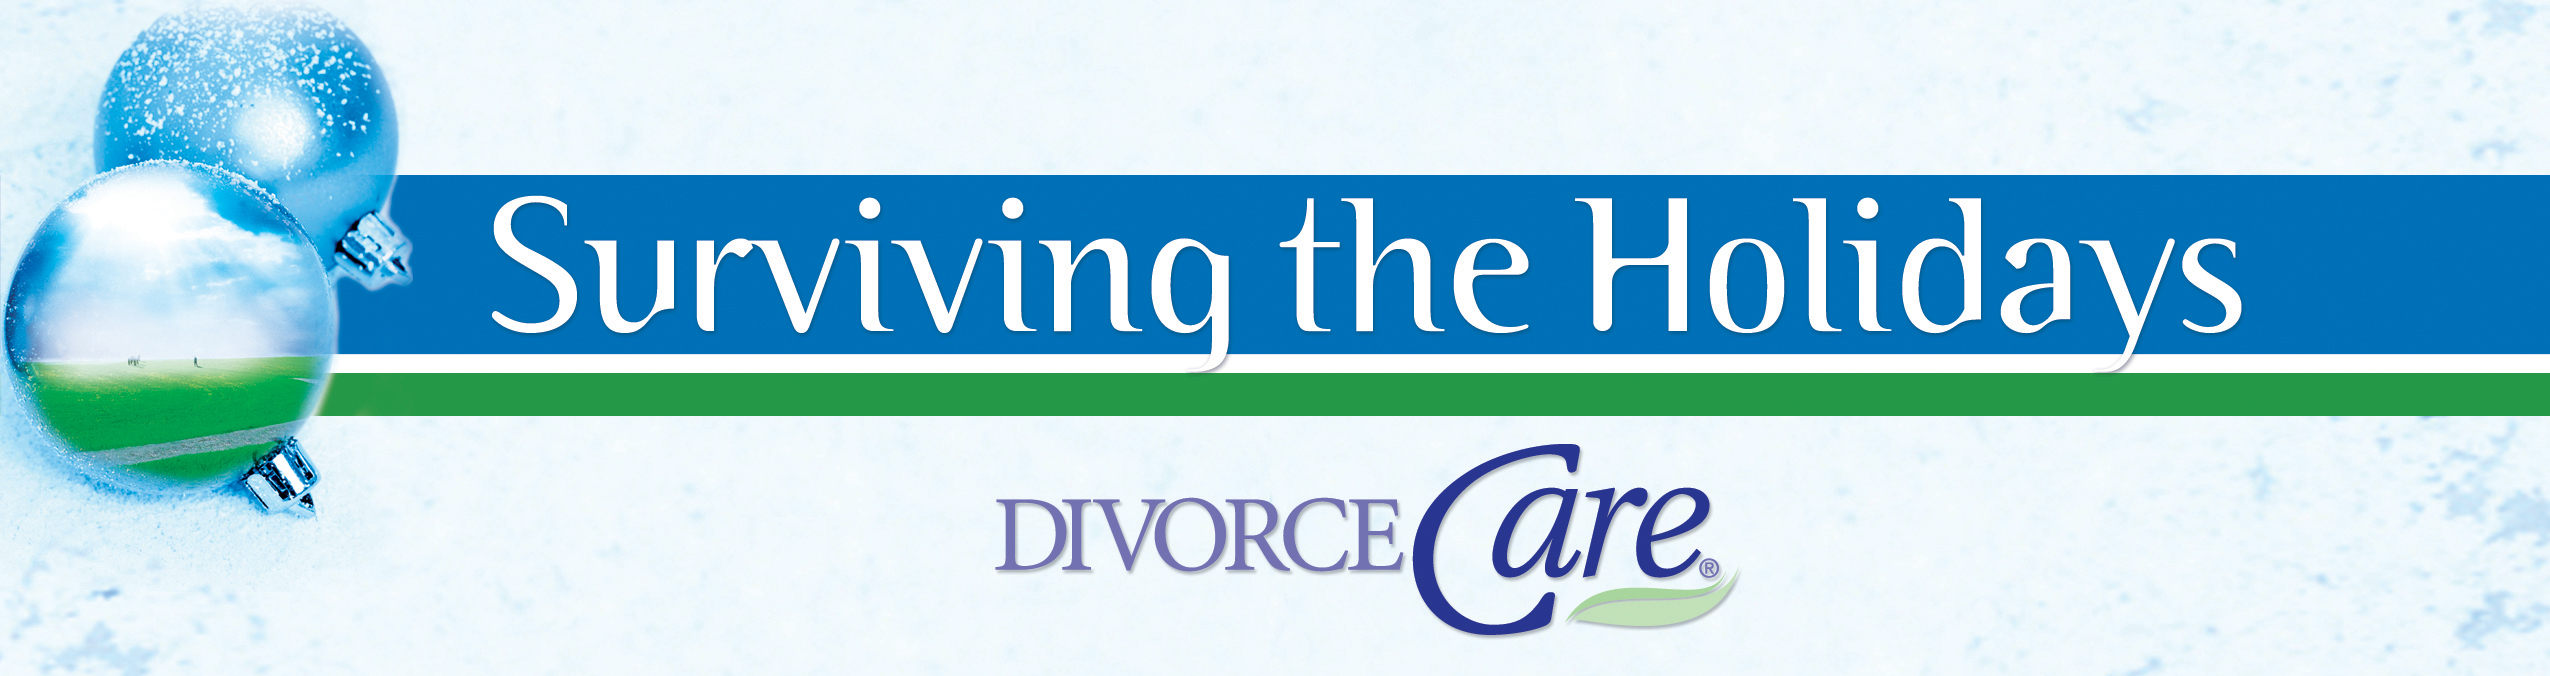 DivorceCare Surviving the Holidays logo